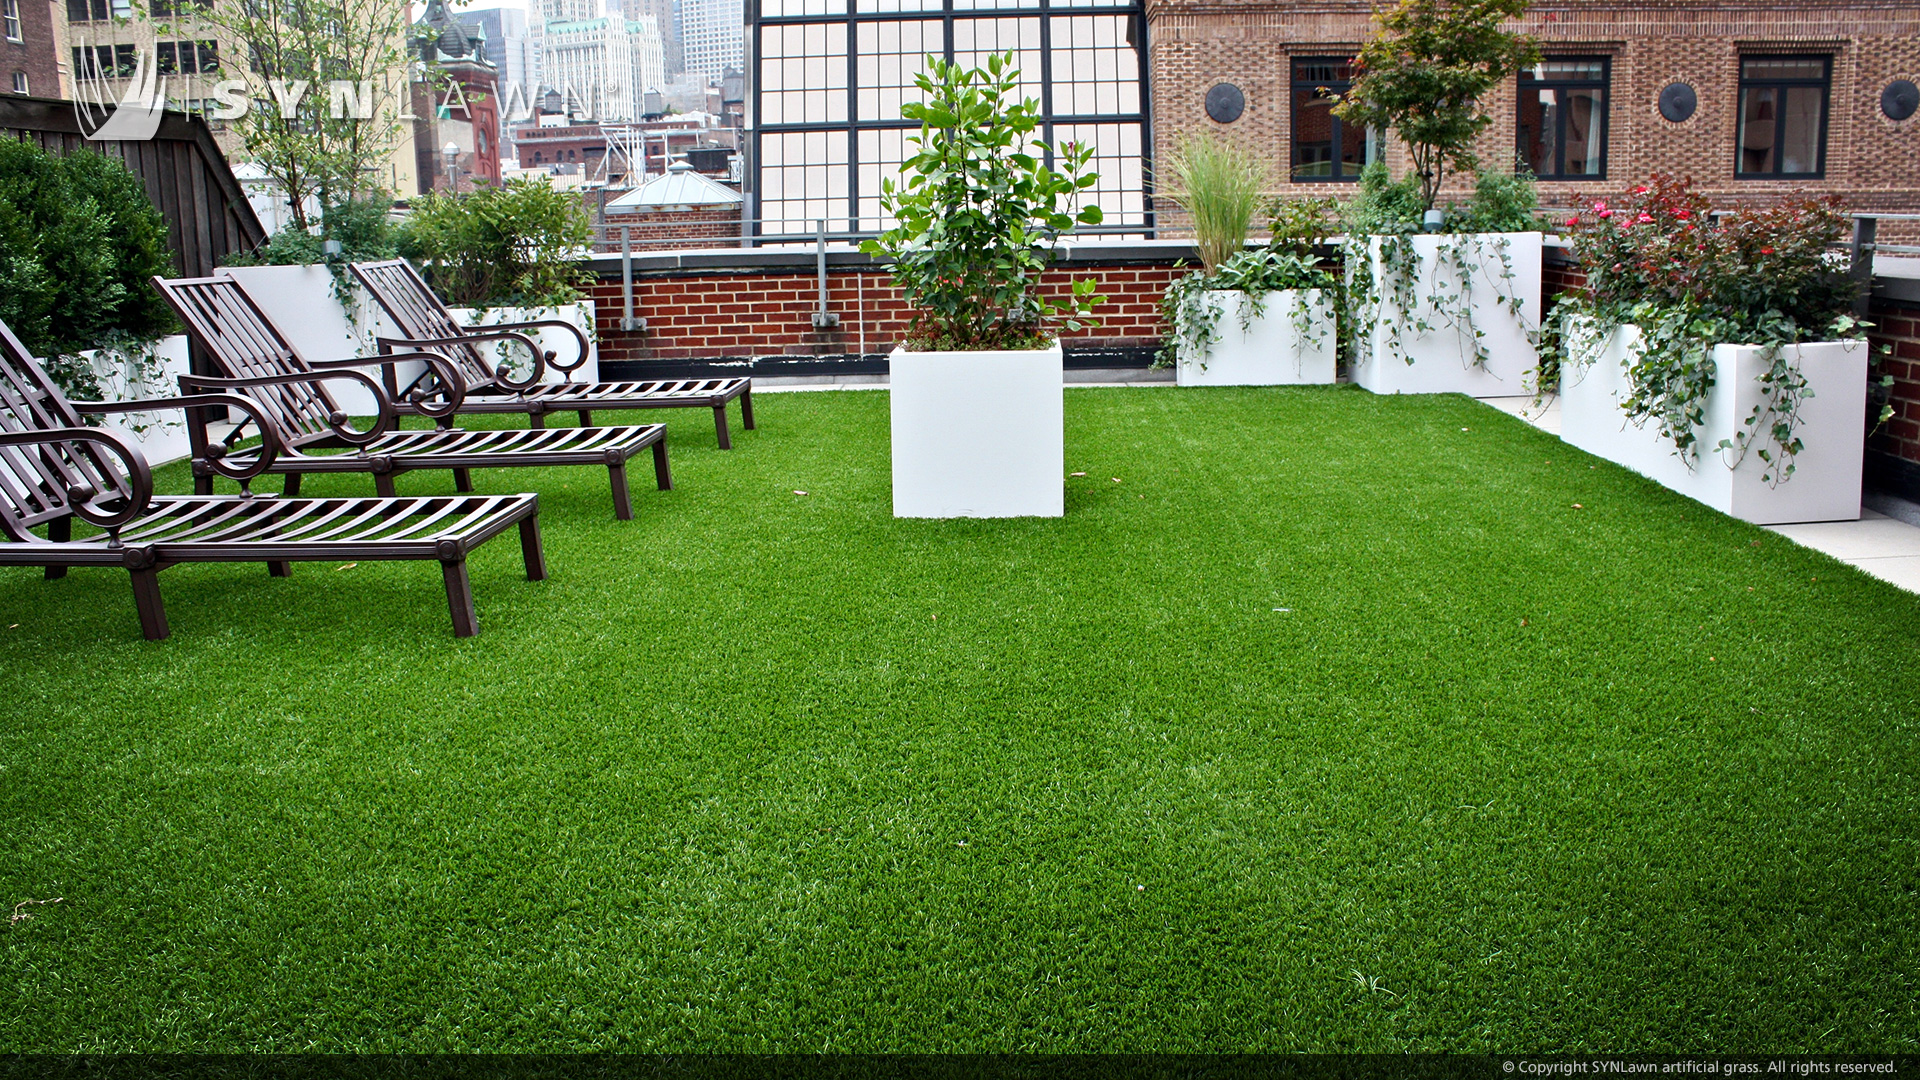 Exterior Home Design Games Comfortable Decks With Artificial Grass Your Home